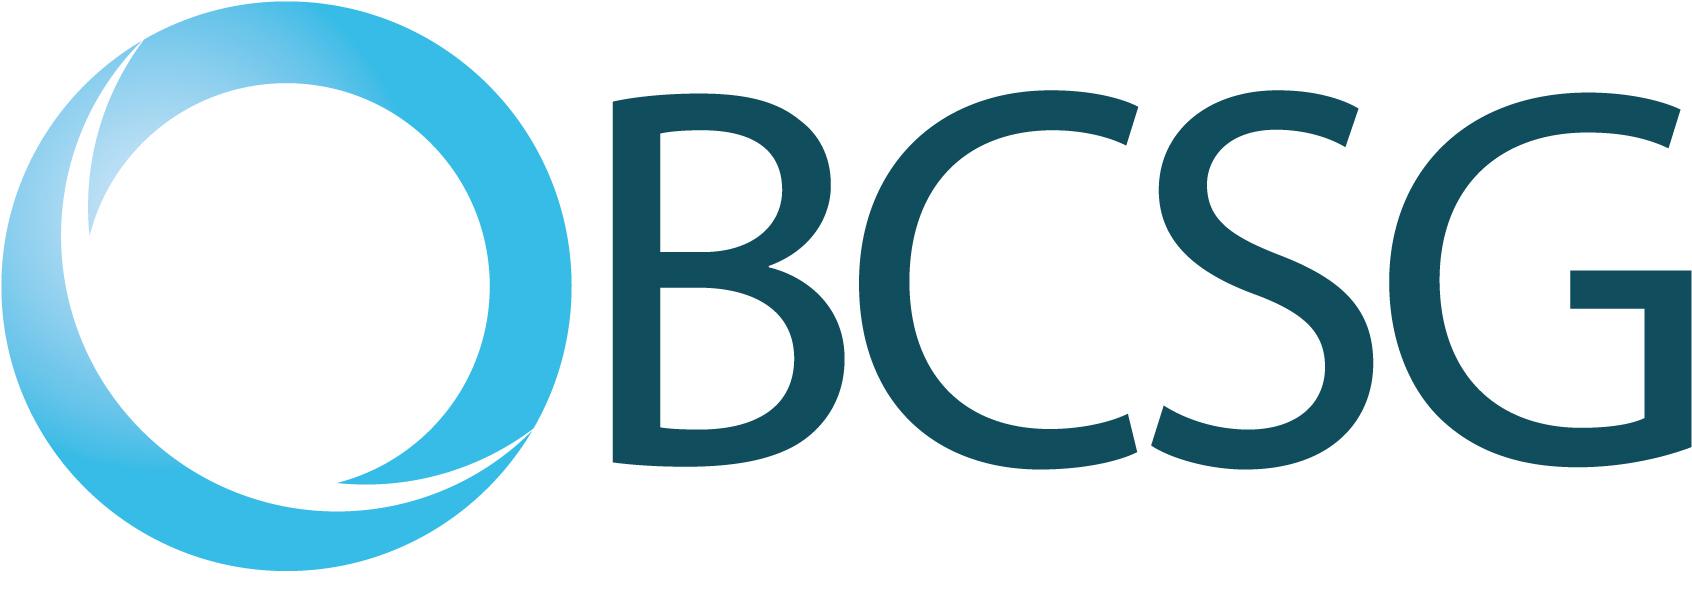 BCSG hires Simon Lunn from Deutsche Telecom for COO role